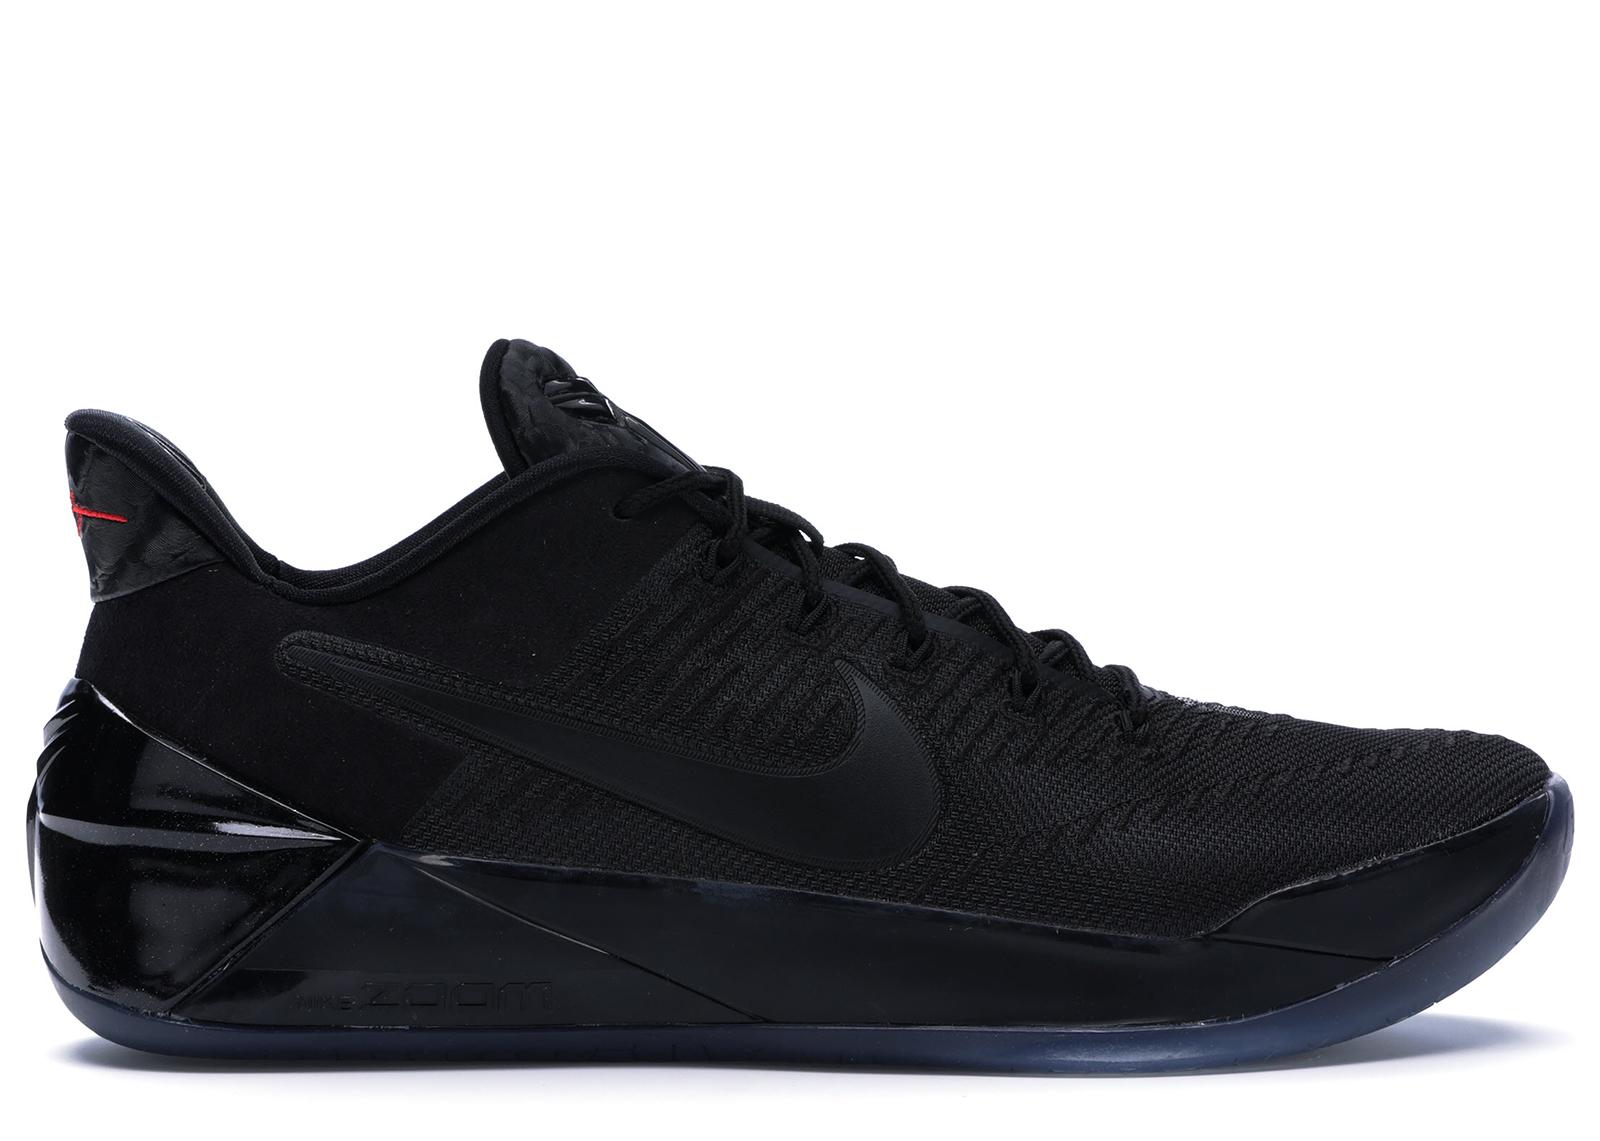 Nike Kobe A.D. Black Mamba - 852425-064